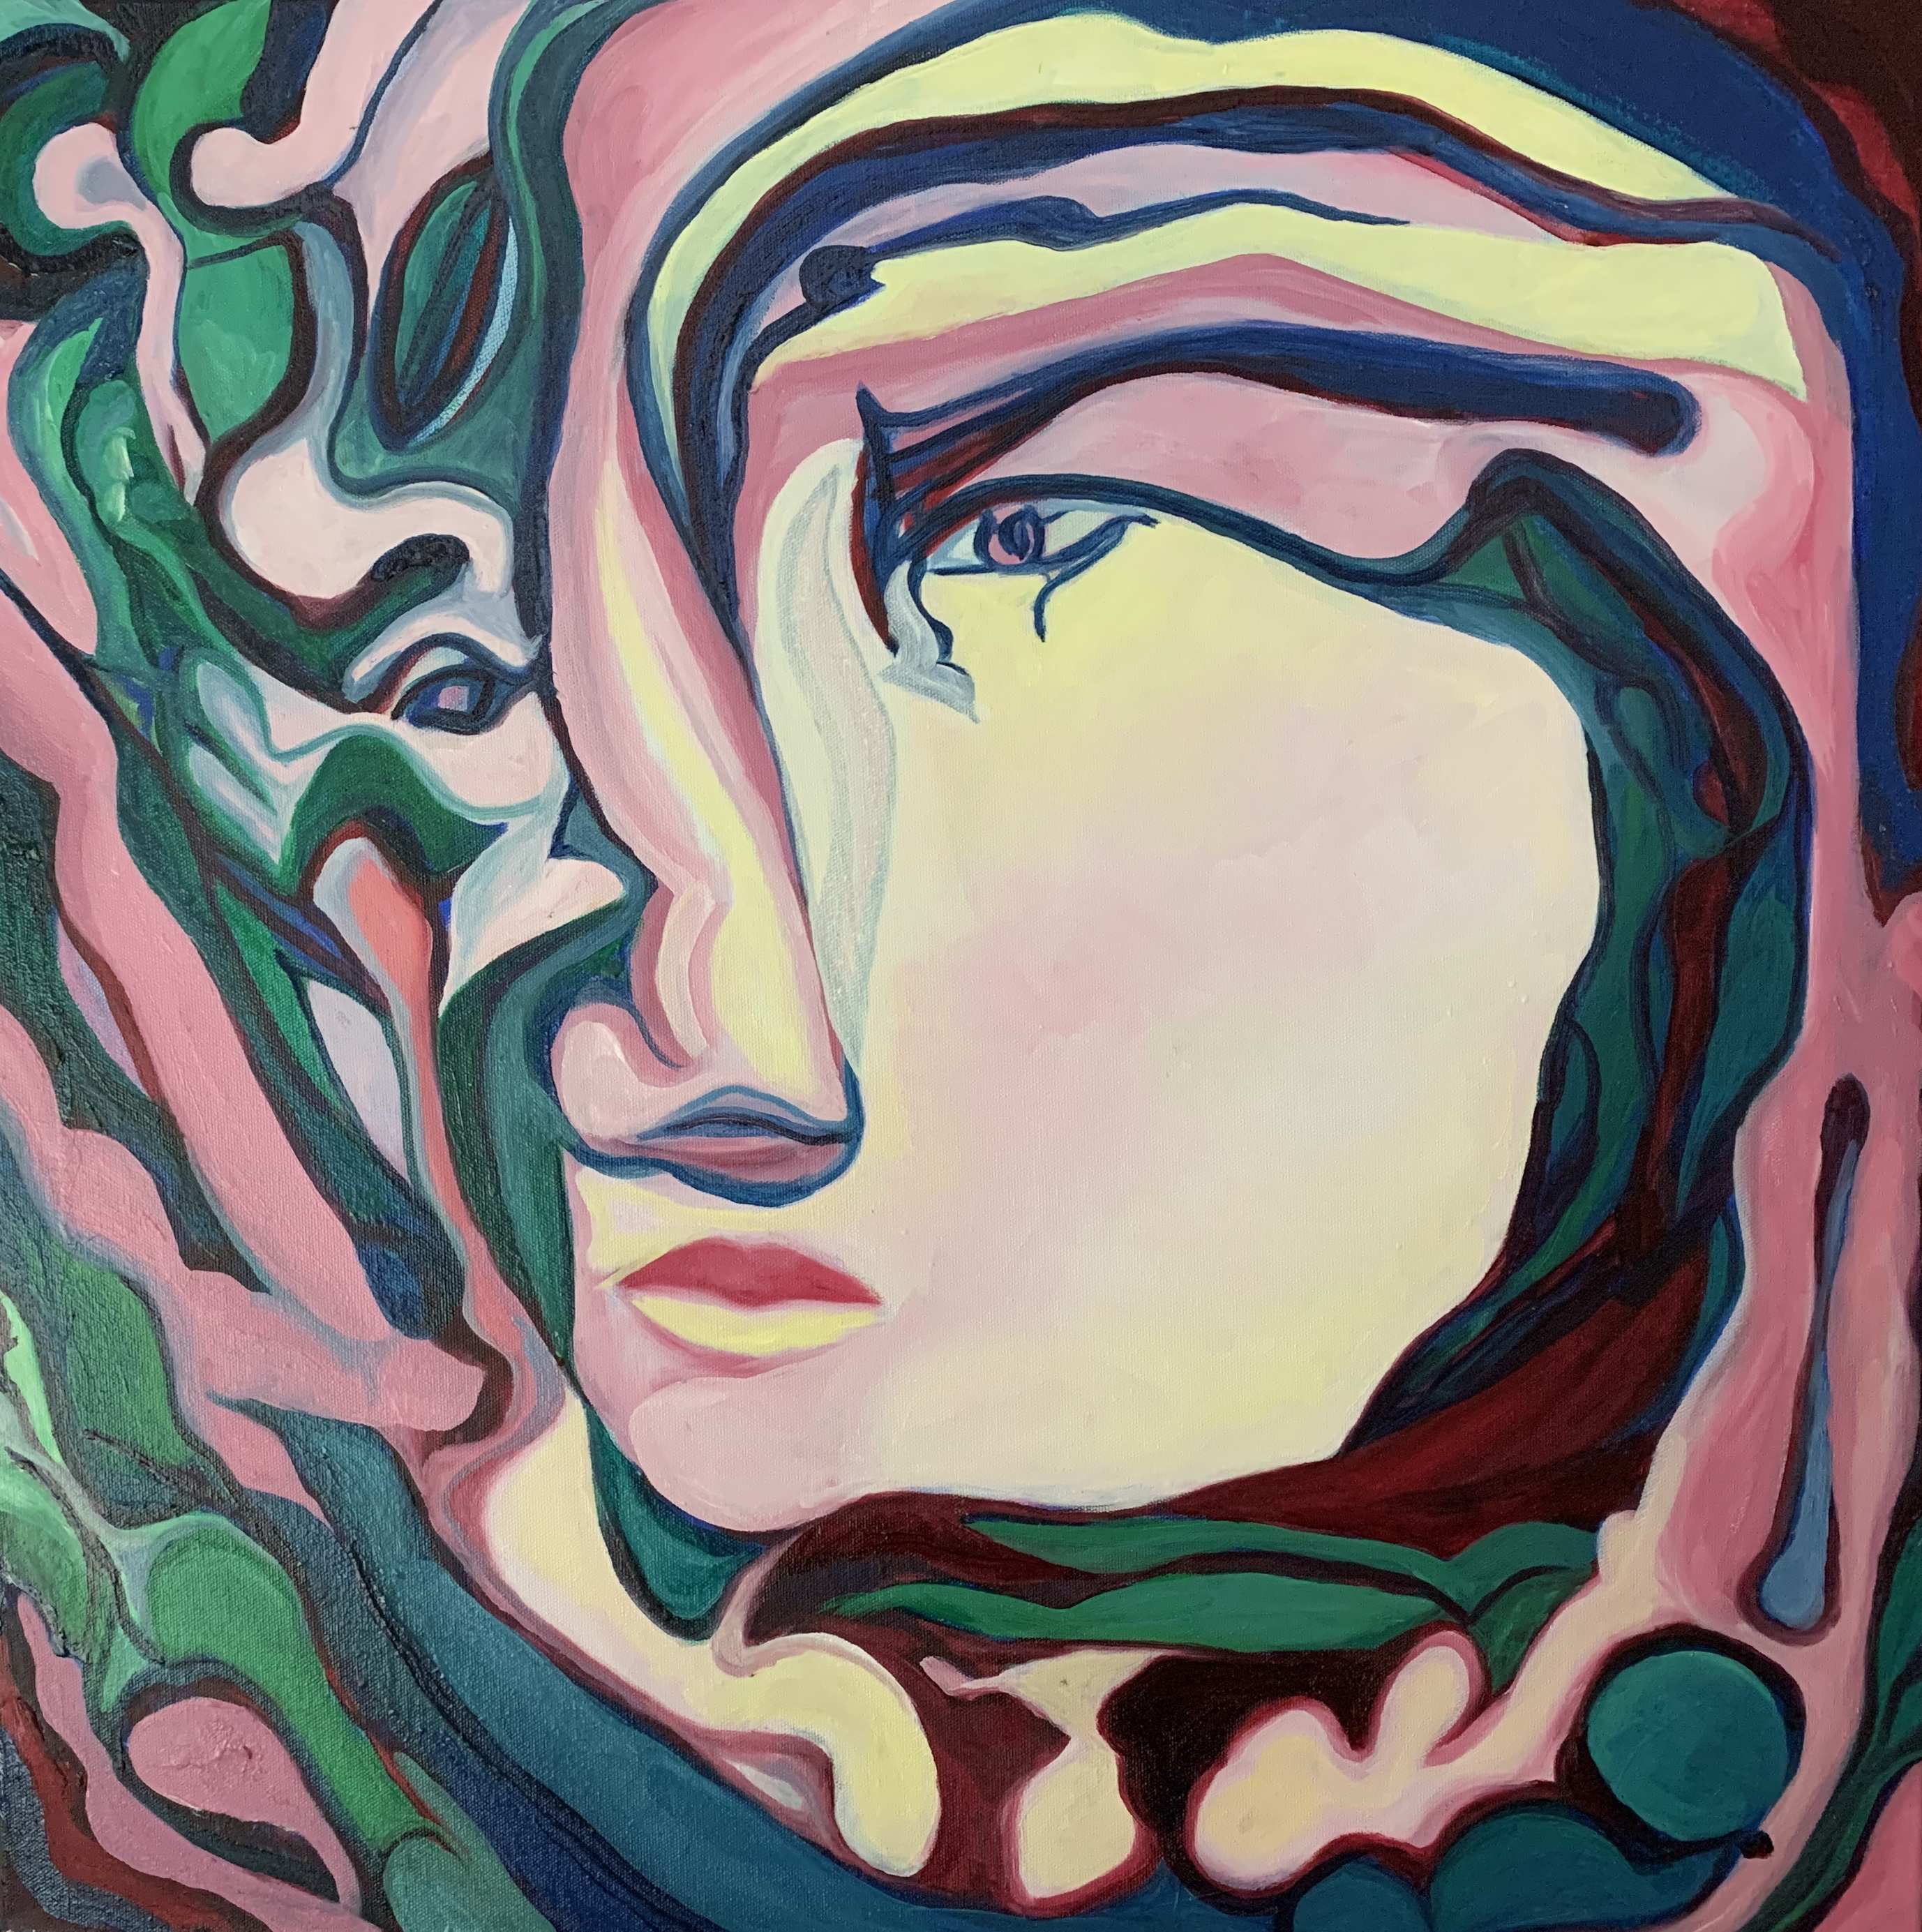 Charlotte Mouquin - Visions 2 24x24- oil